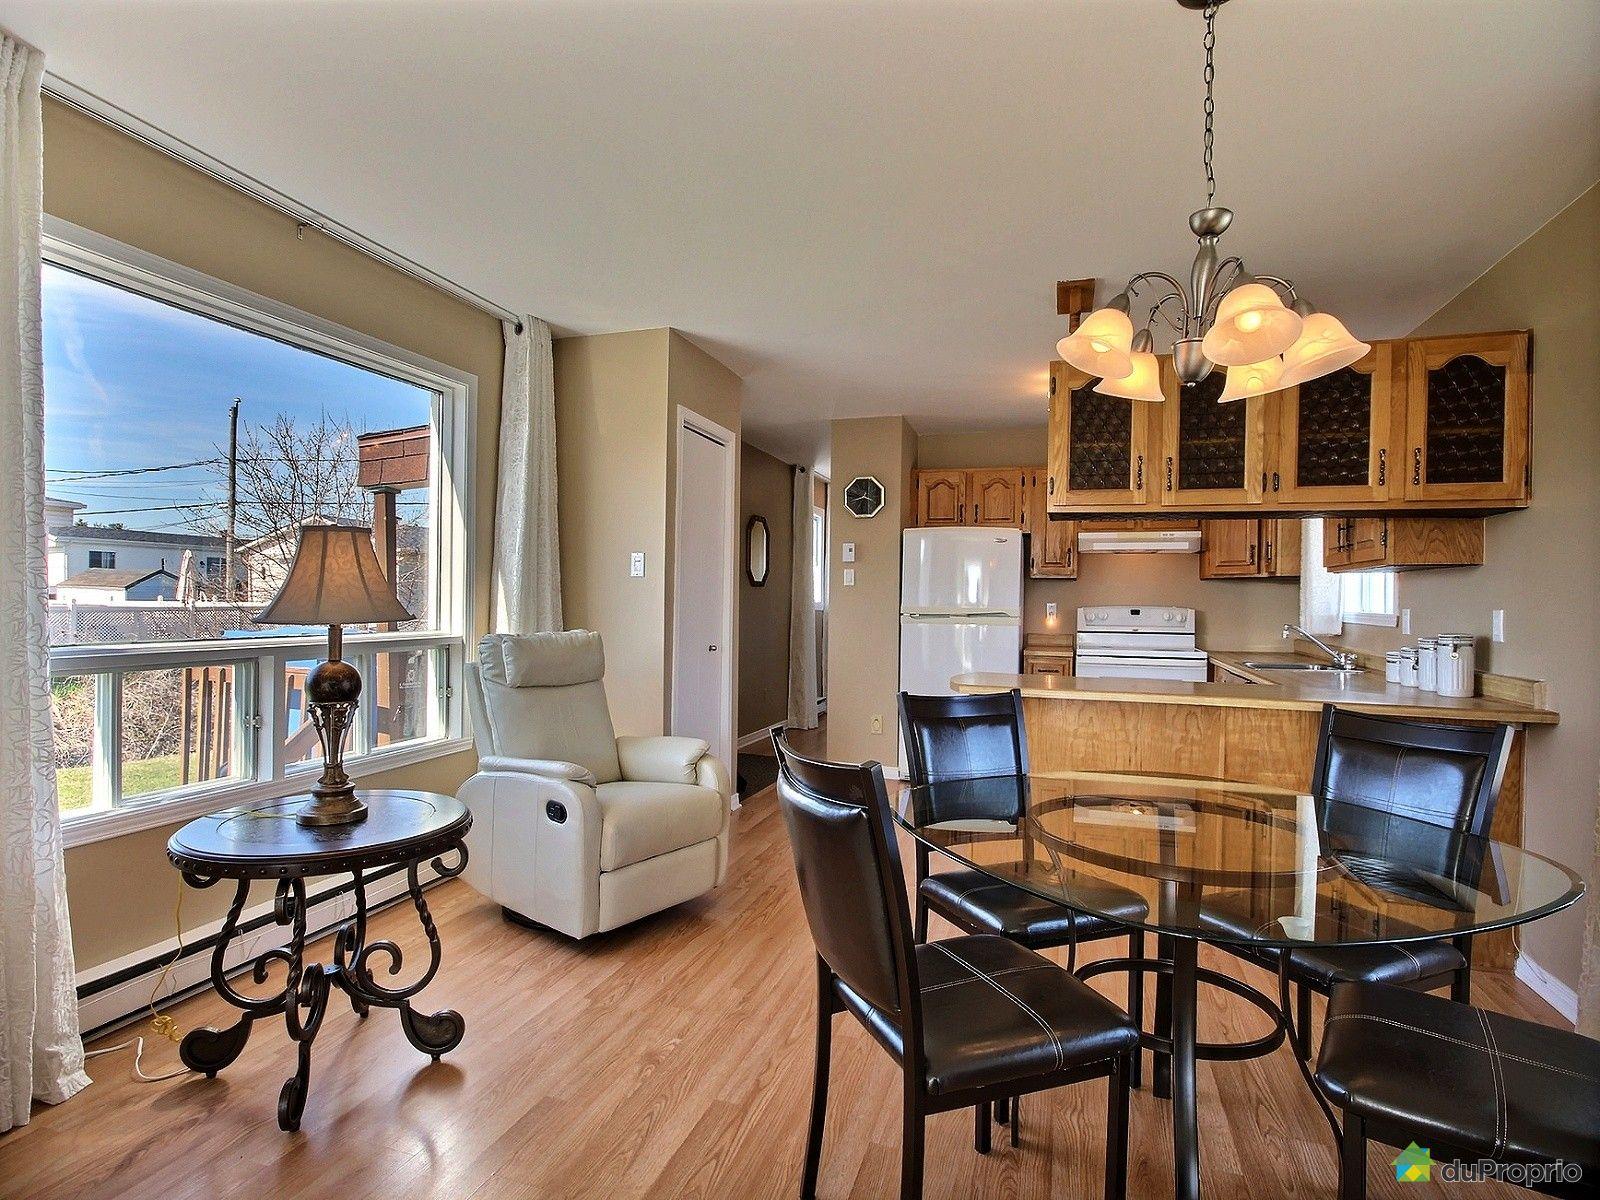 maison vendre l 39 assomption 32 rue sylvie immobilier qu bec duproprio 699399. Black Bedroom Furniture Sets. Home Design Ideas